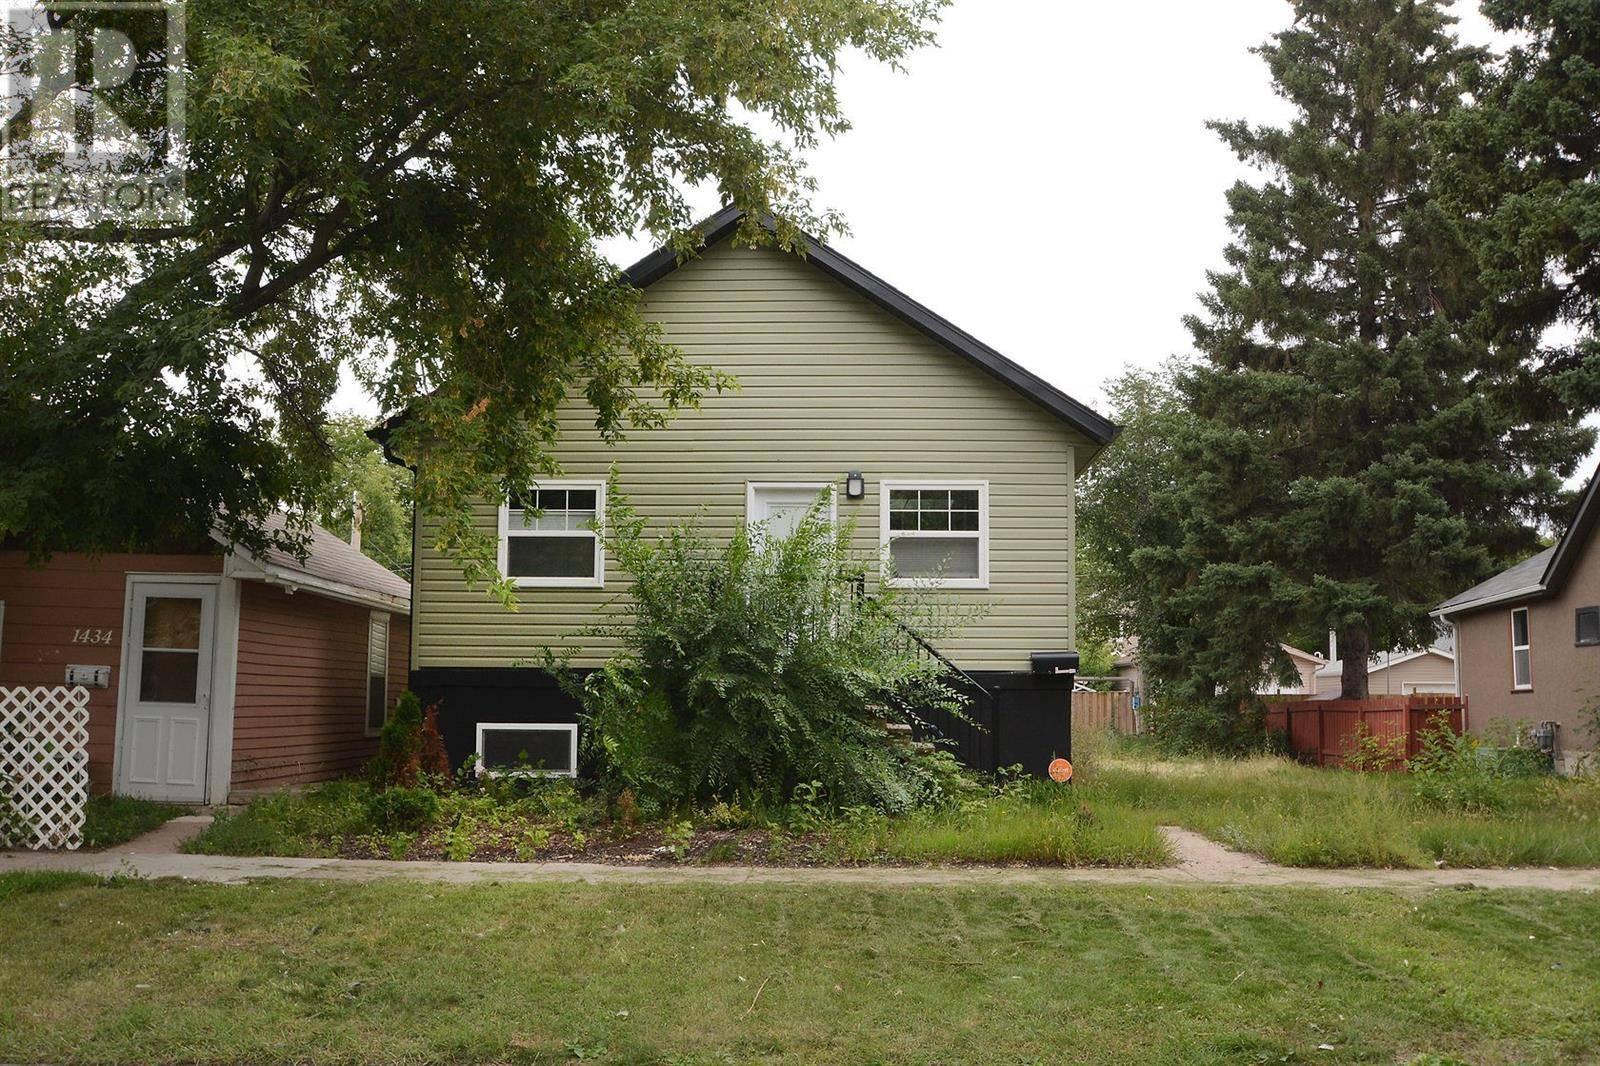 House for sale at 1432 D Ave N Saskatoon Saskatchewan - MLS: SK783334